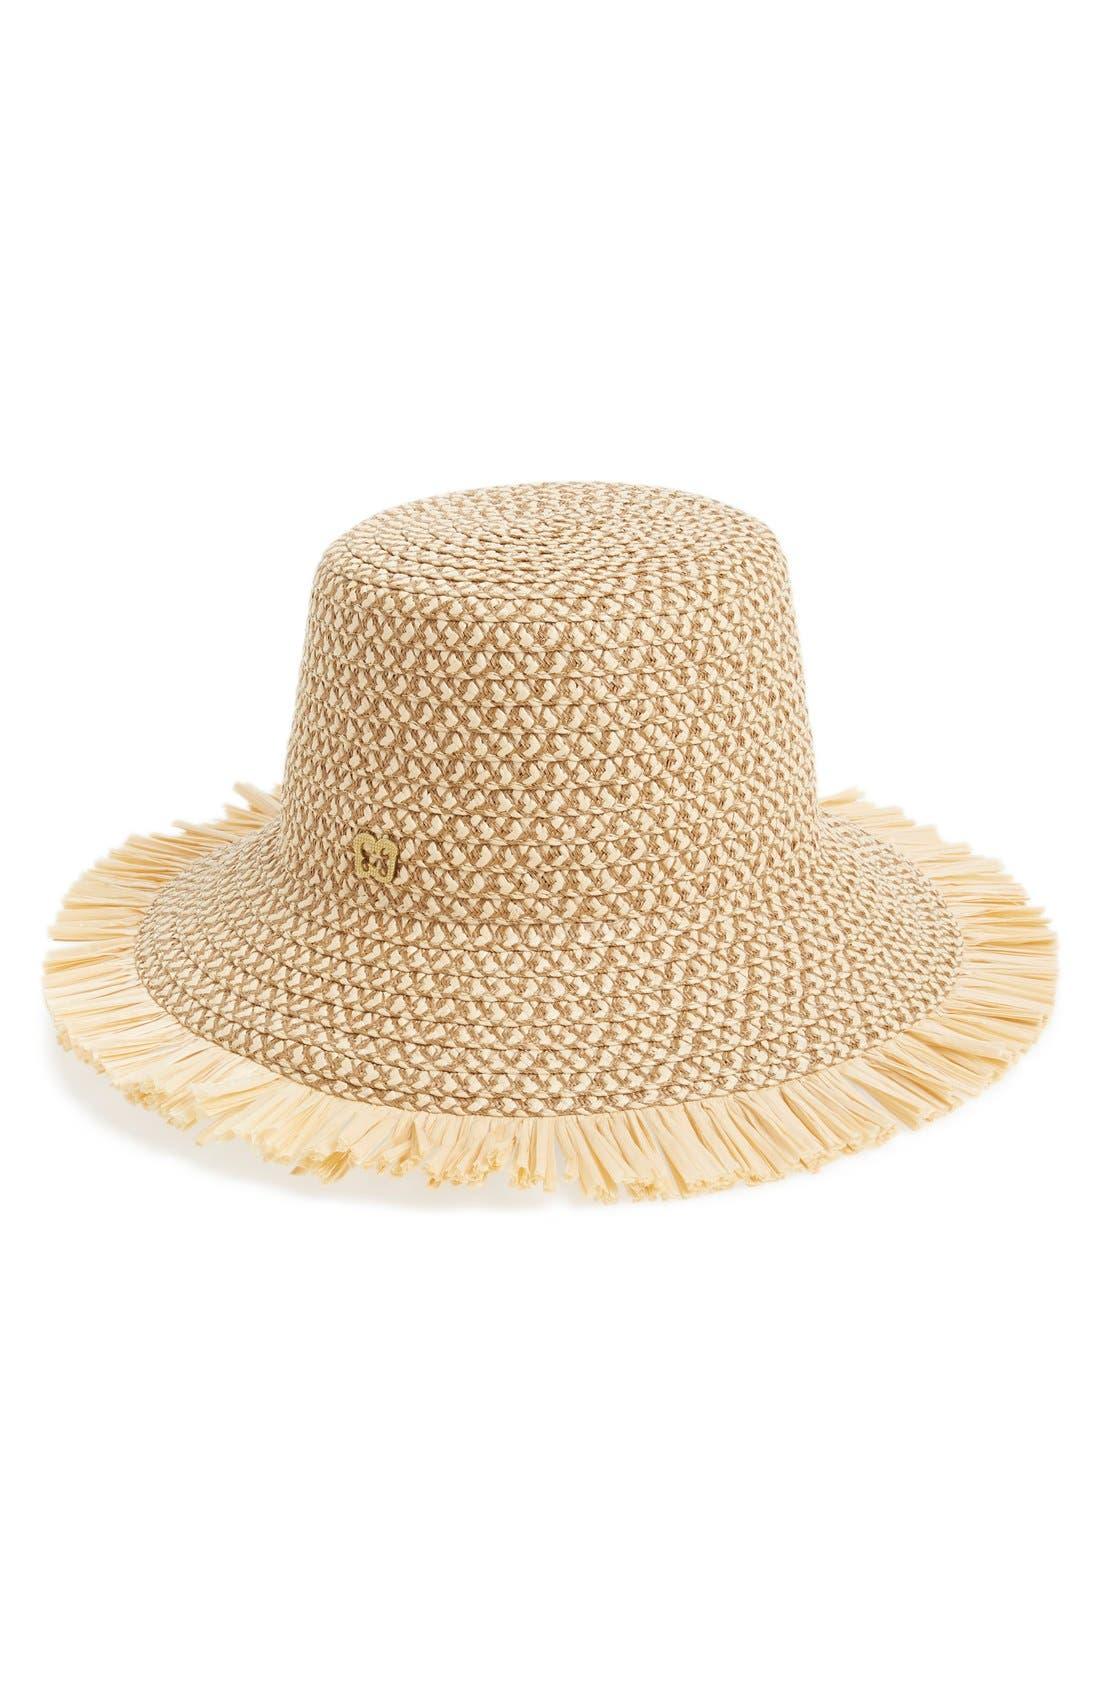 Alternate Image 1 Selected - Eric Javits 'Tiki' Bucket Hat